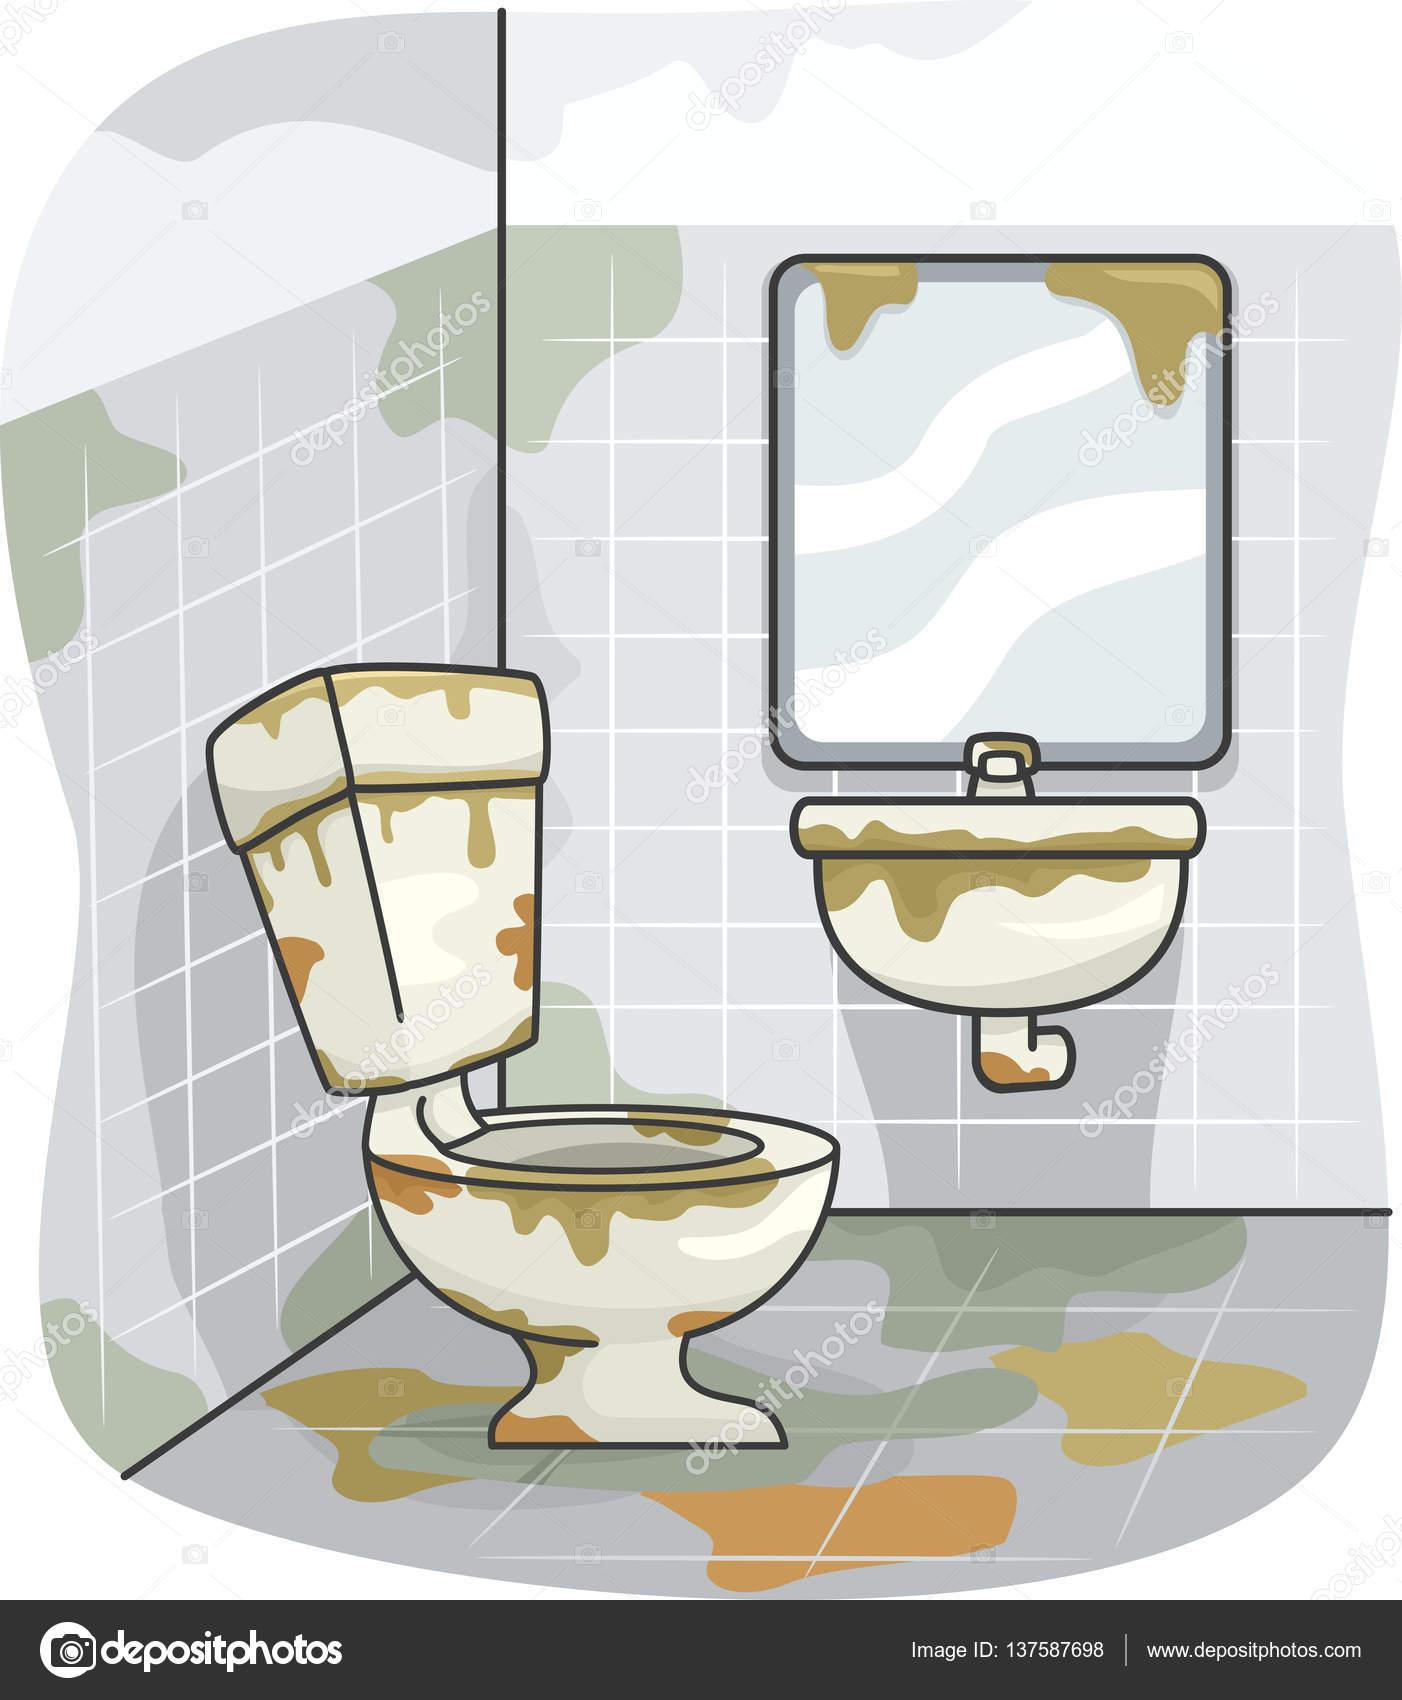 Dirty Bathroom Pics: ストック写真 © Lenmdp #137587698